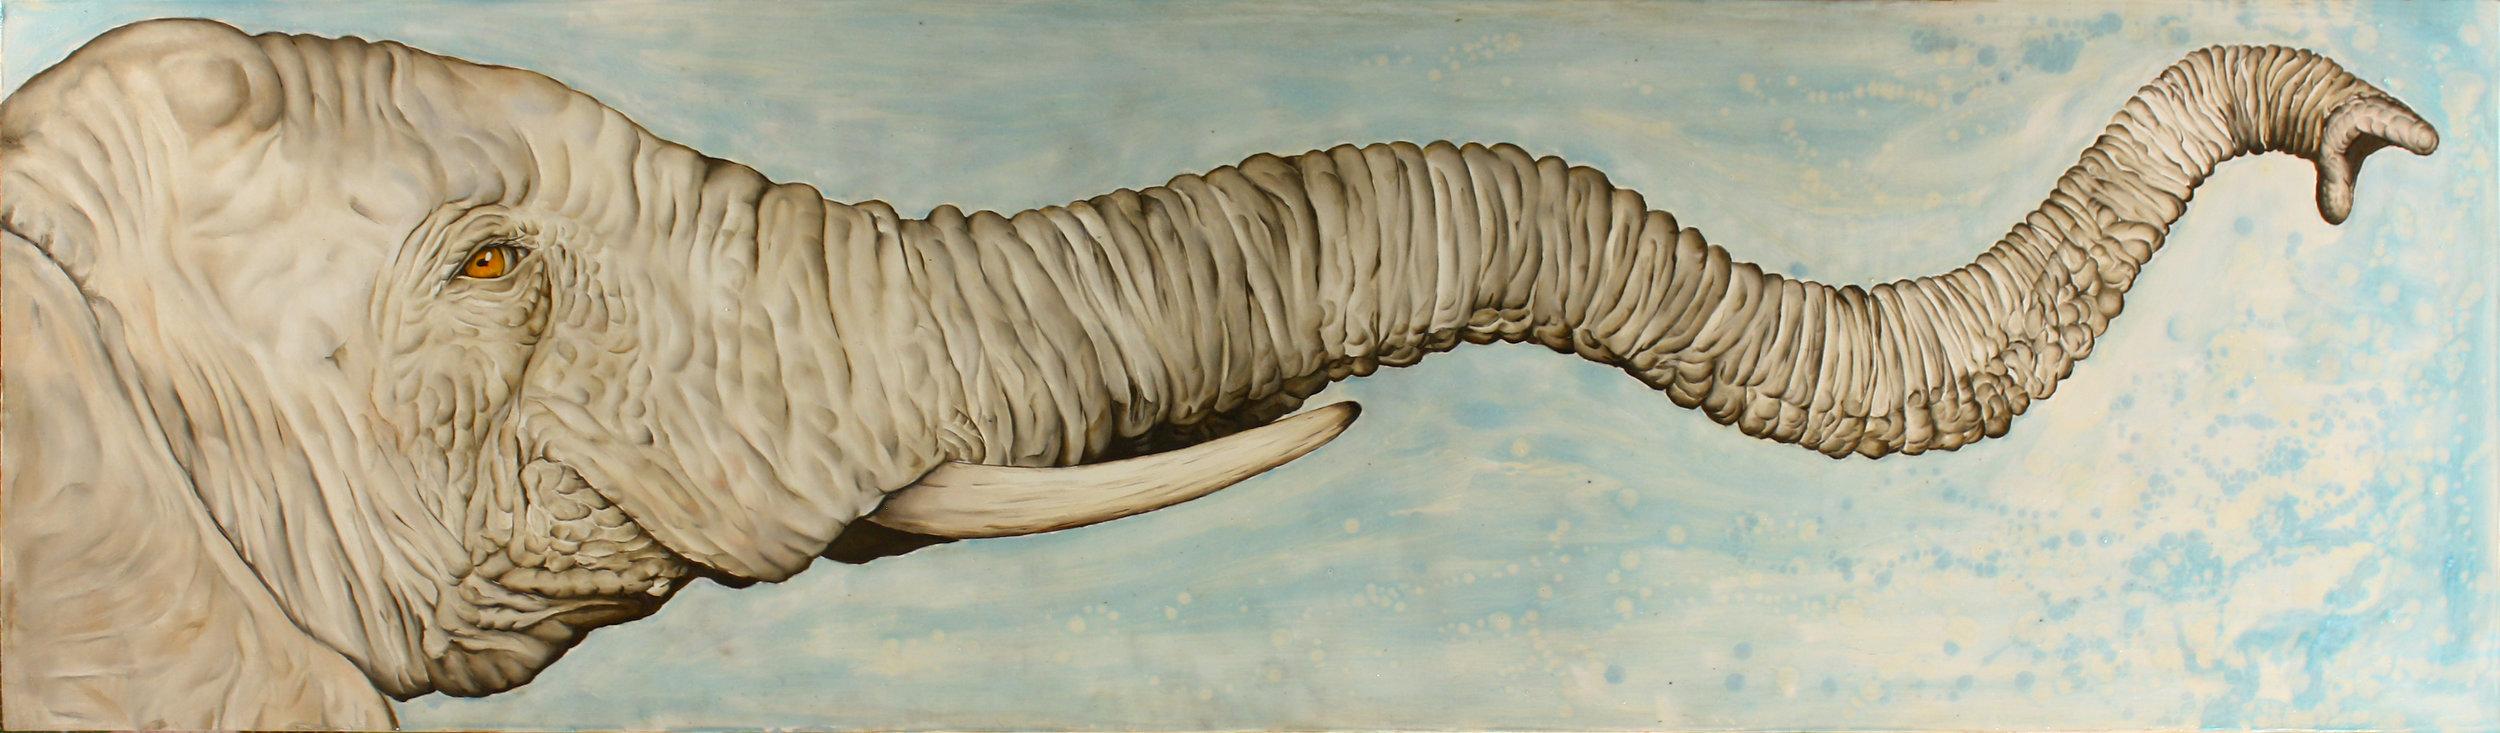 James Russell May - ElephantOil & Polymer Emulsion on Wood18 x 16www.jamesrussellmay.com